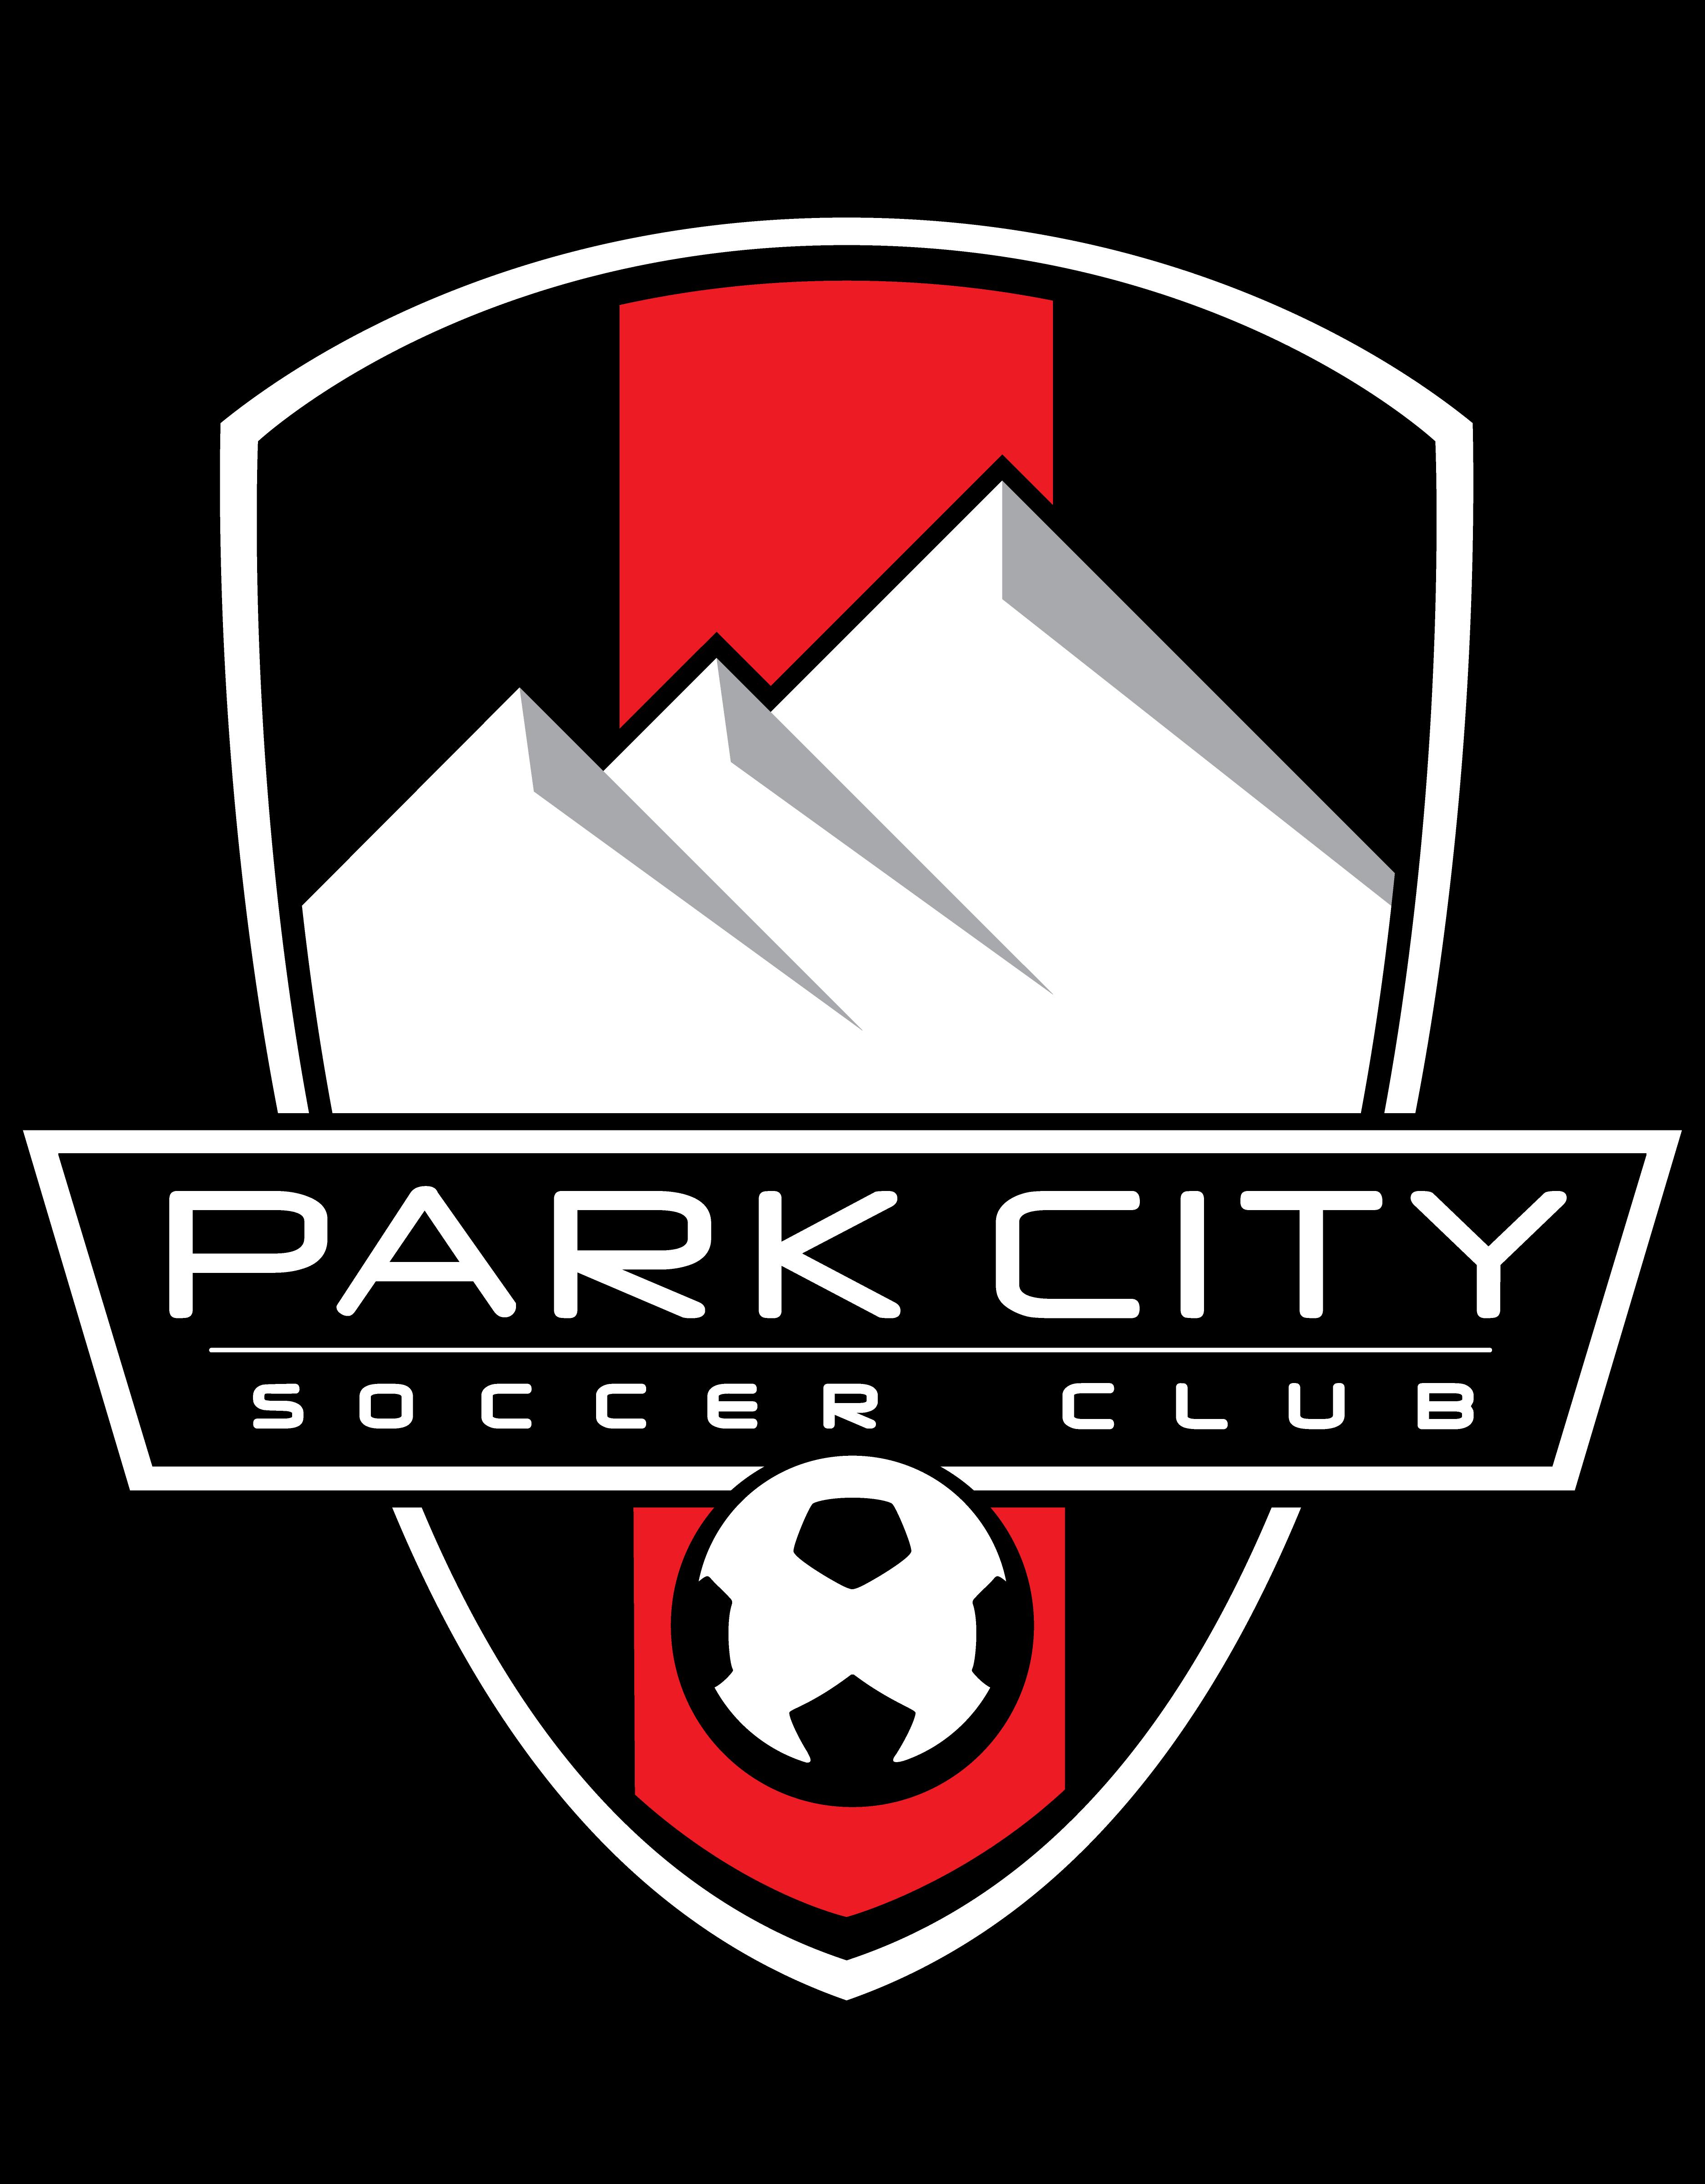 Park City Soccer Club 6300 N Sagewood Drive, #h636 Park City, Ut 84098 Pcscdirector@gmail Pluspng.com 435.901.3715 - Socar, Transparent background PNG HD thumbnail